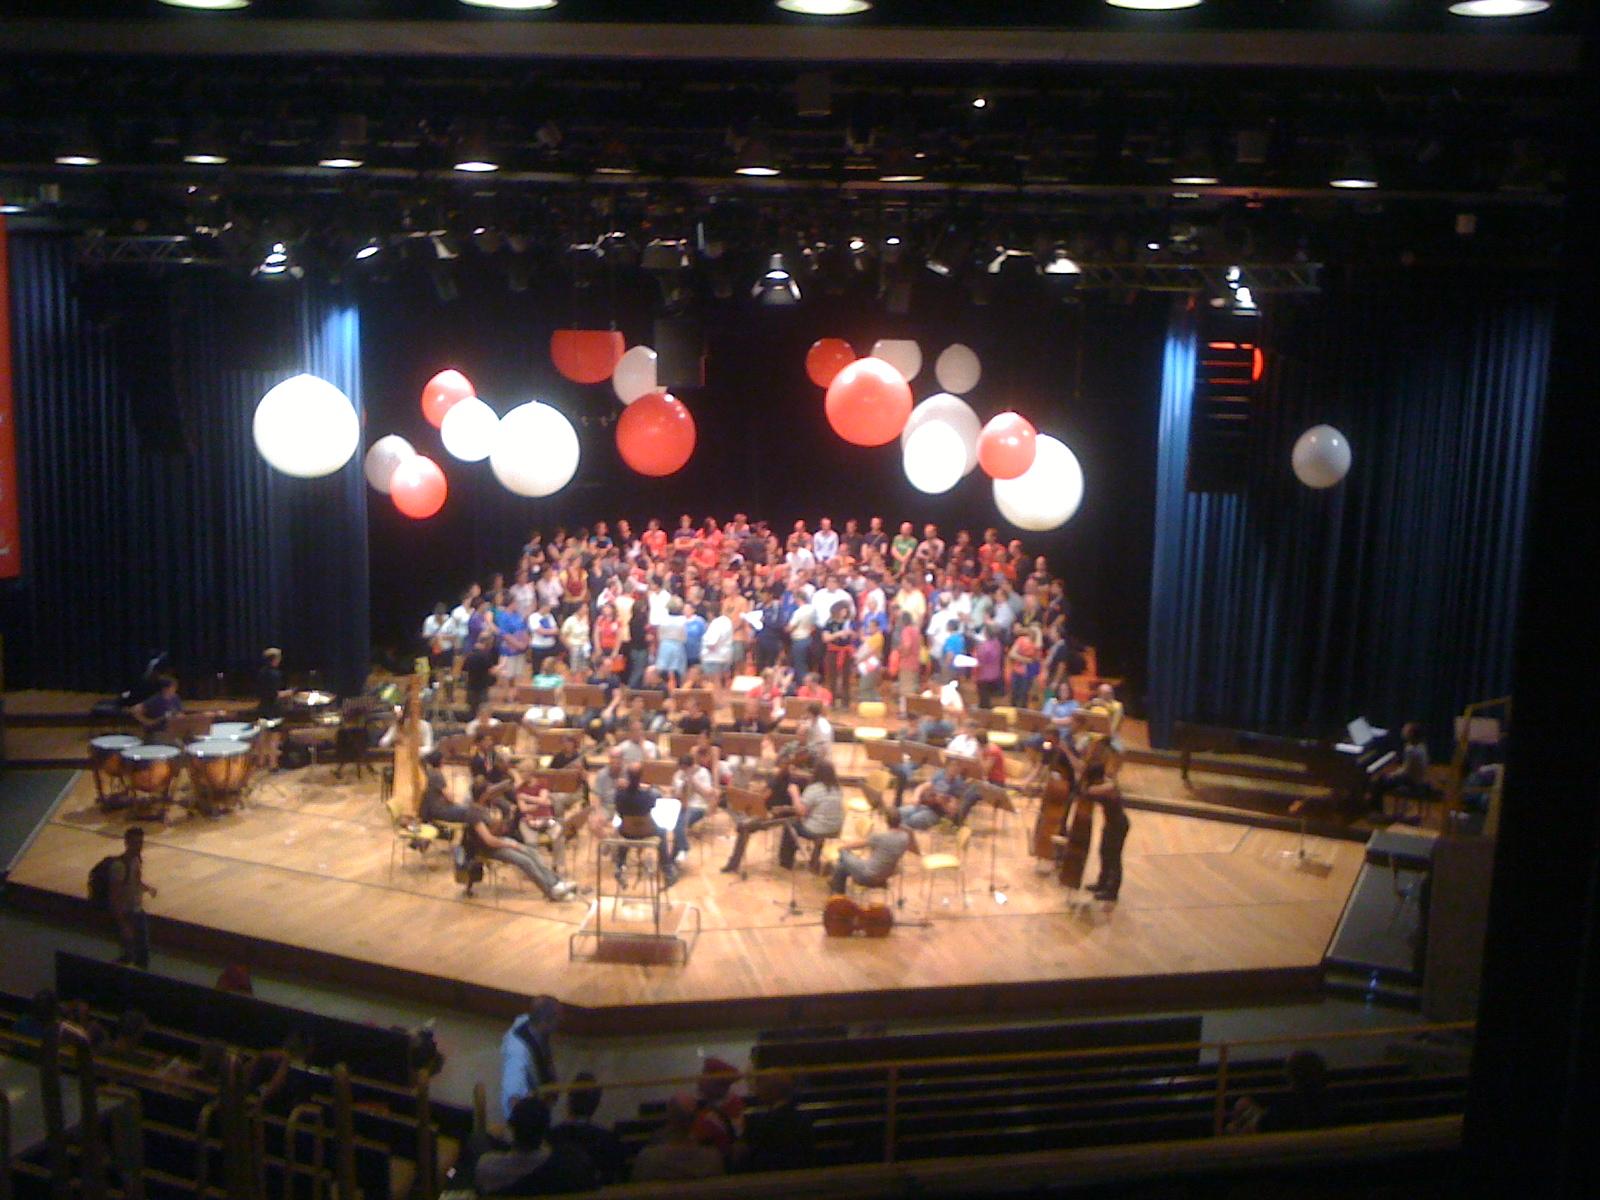 Gala Concert Dress Rehearsal